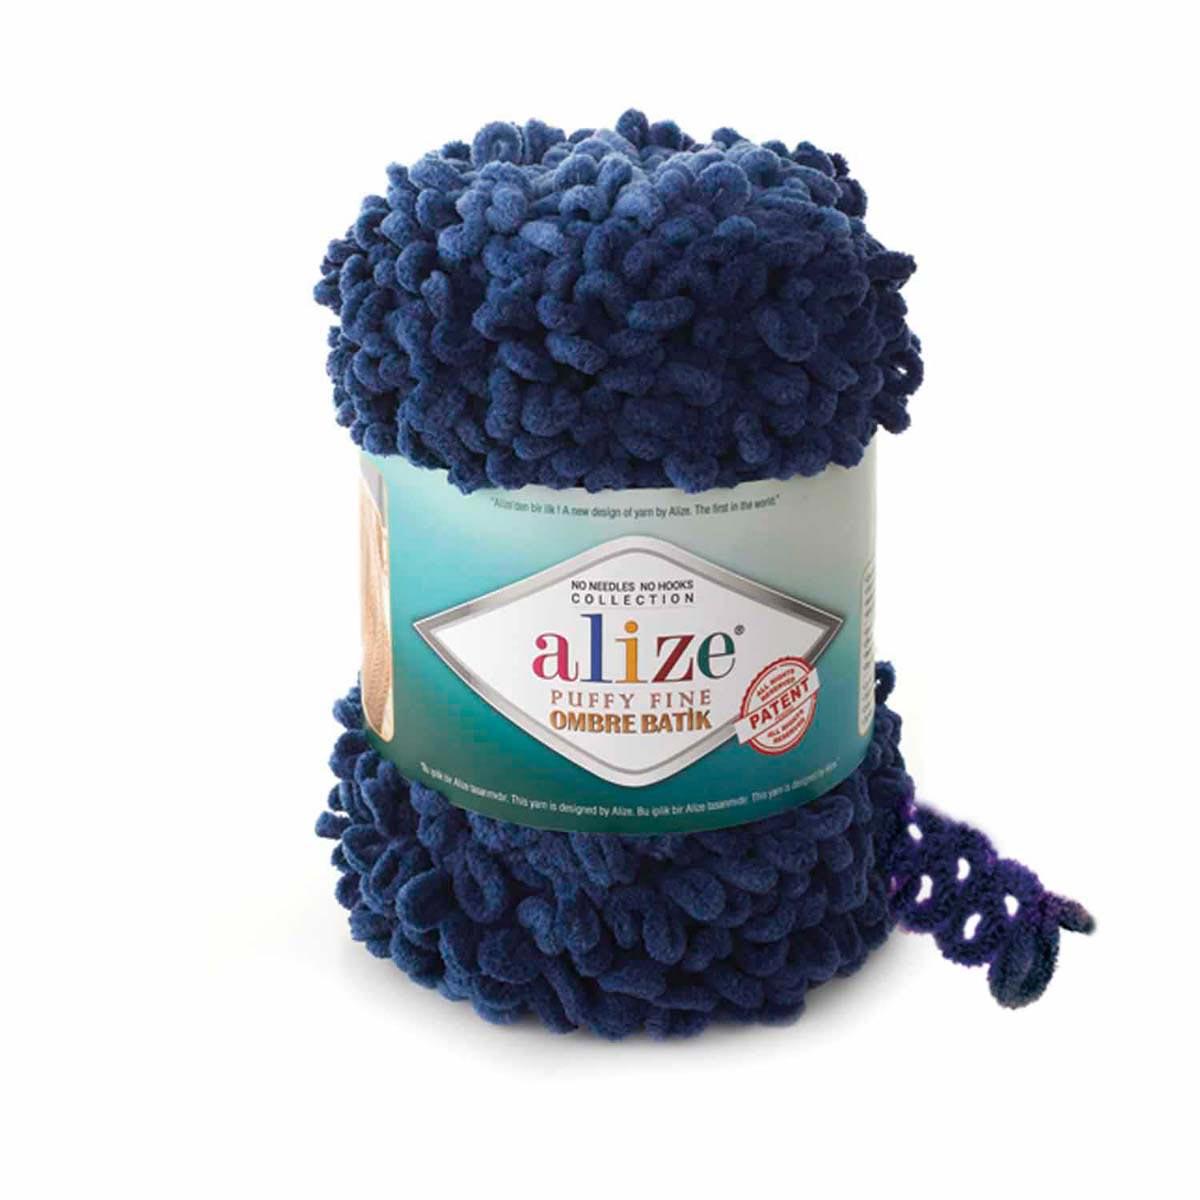 Yarn Alize 'puffy Fine Ombre Batik' 500gr. 73 M. (100% Micro Polyester) (7266 Dark Blue)